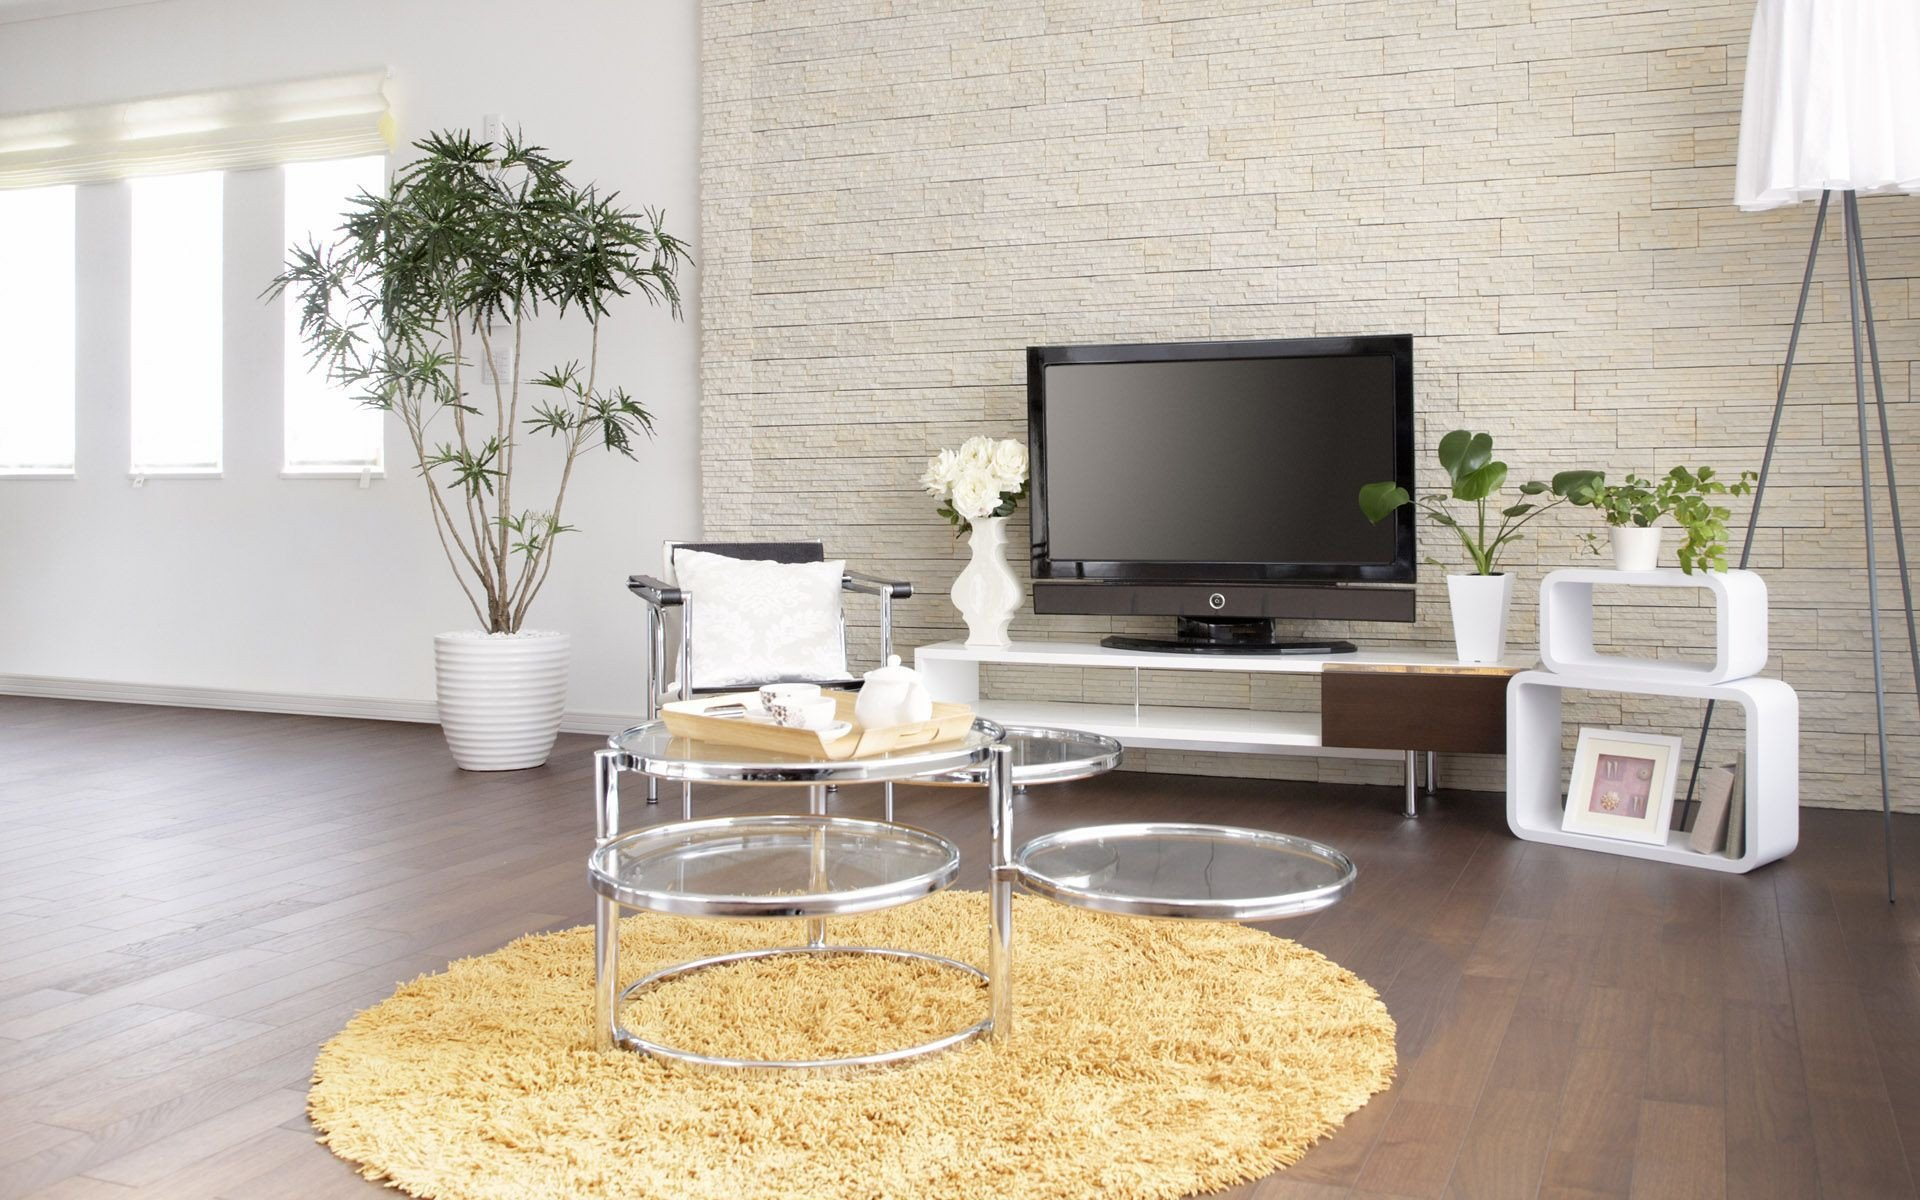 Contemporary Living Room Wallpaper New Modern Wallpaper Living Room 24 Inspiration Enhancedhomes